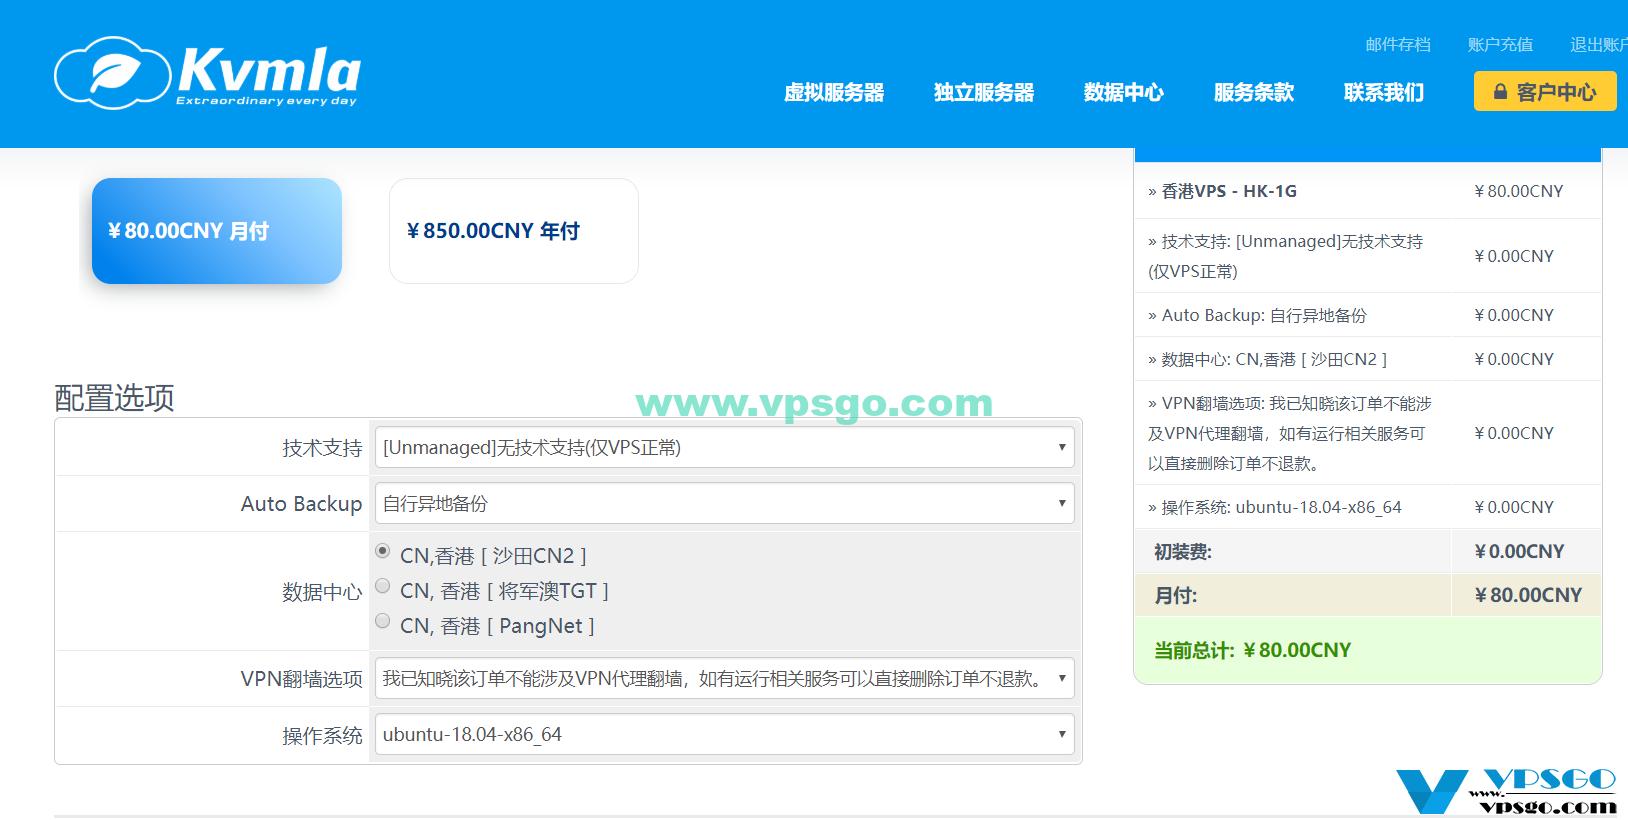 Kvmla香港VPS